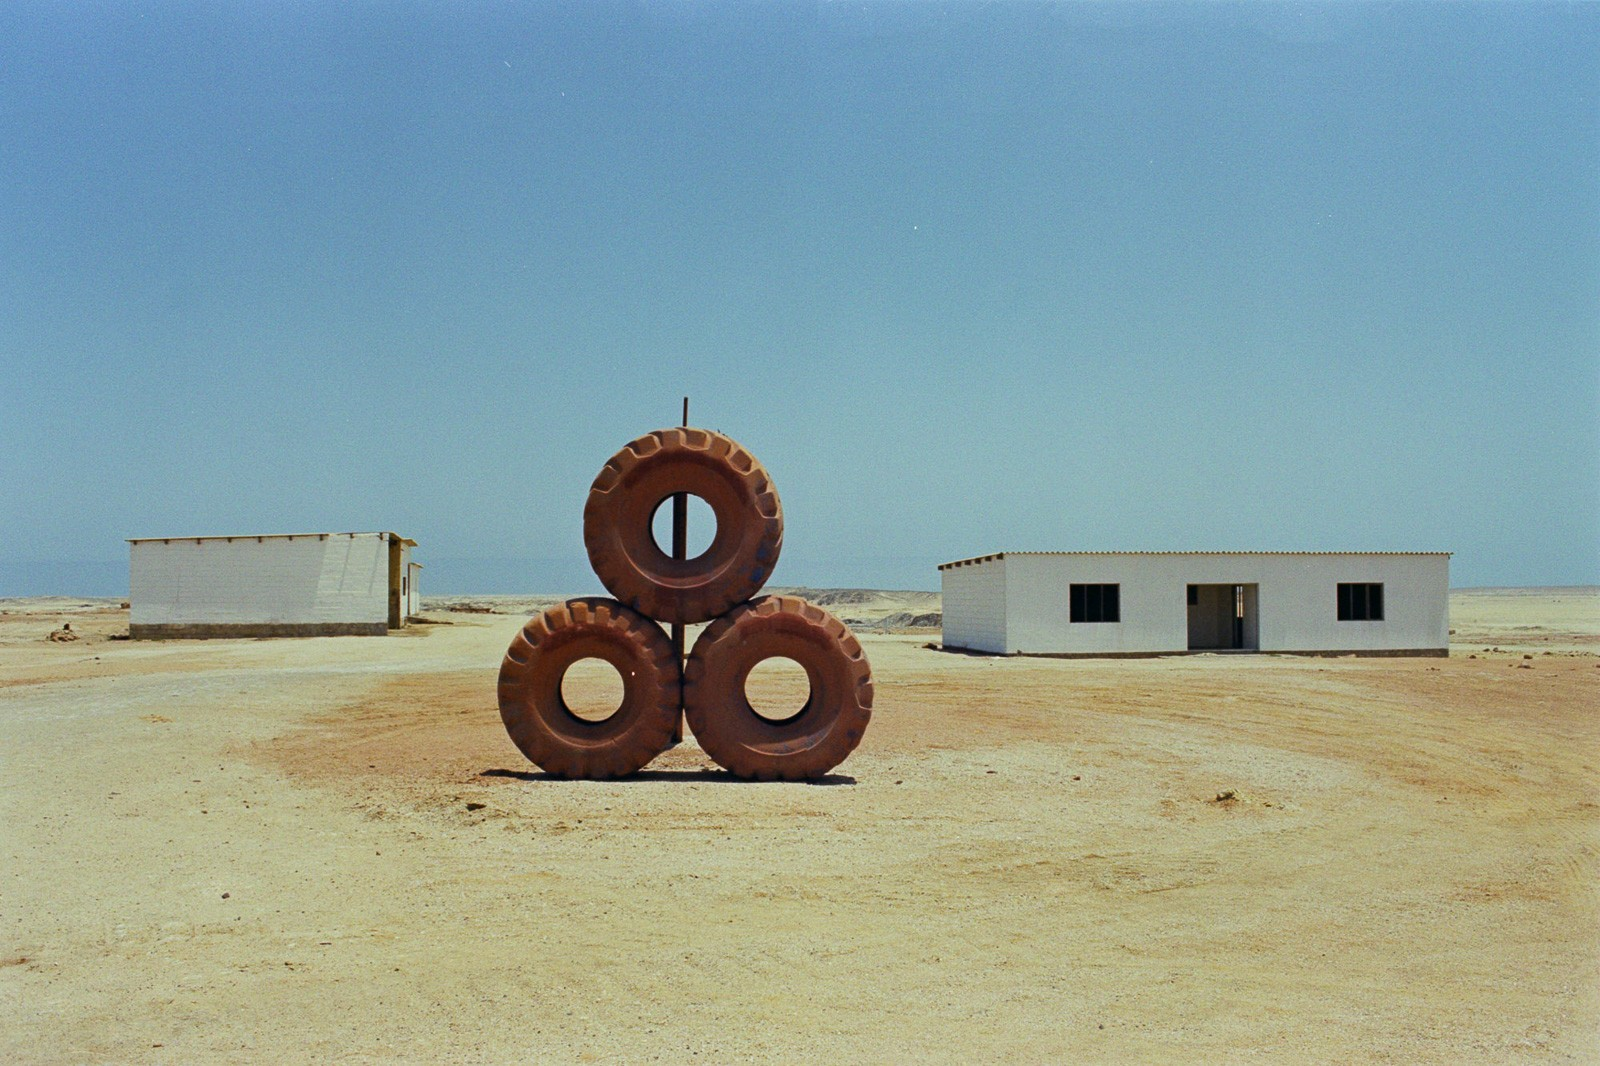 namibia-desolation-07.jpg